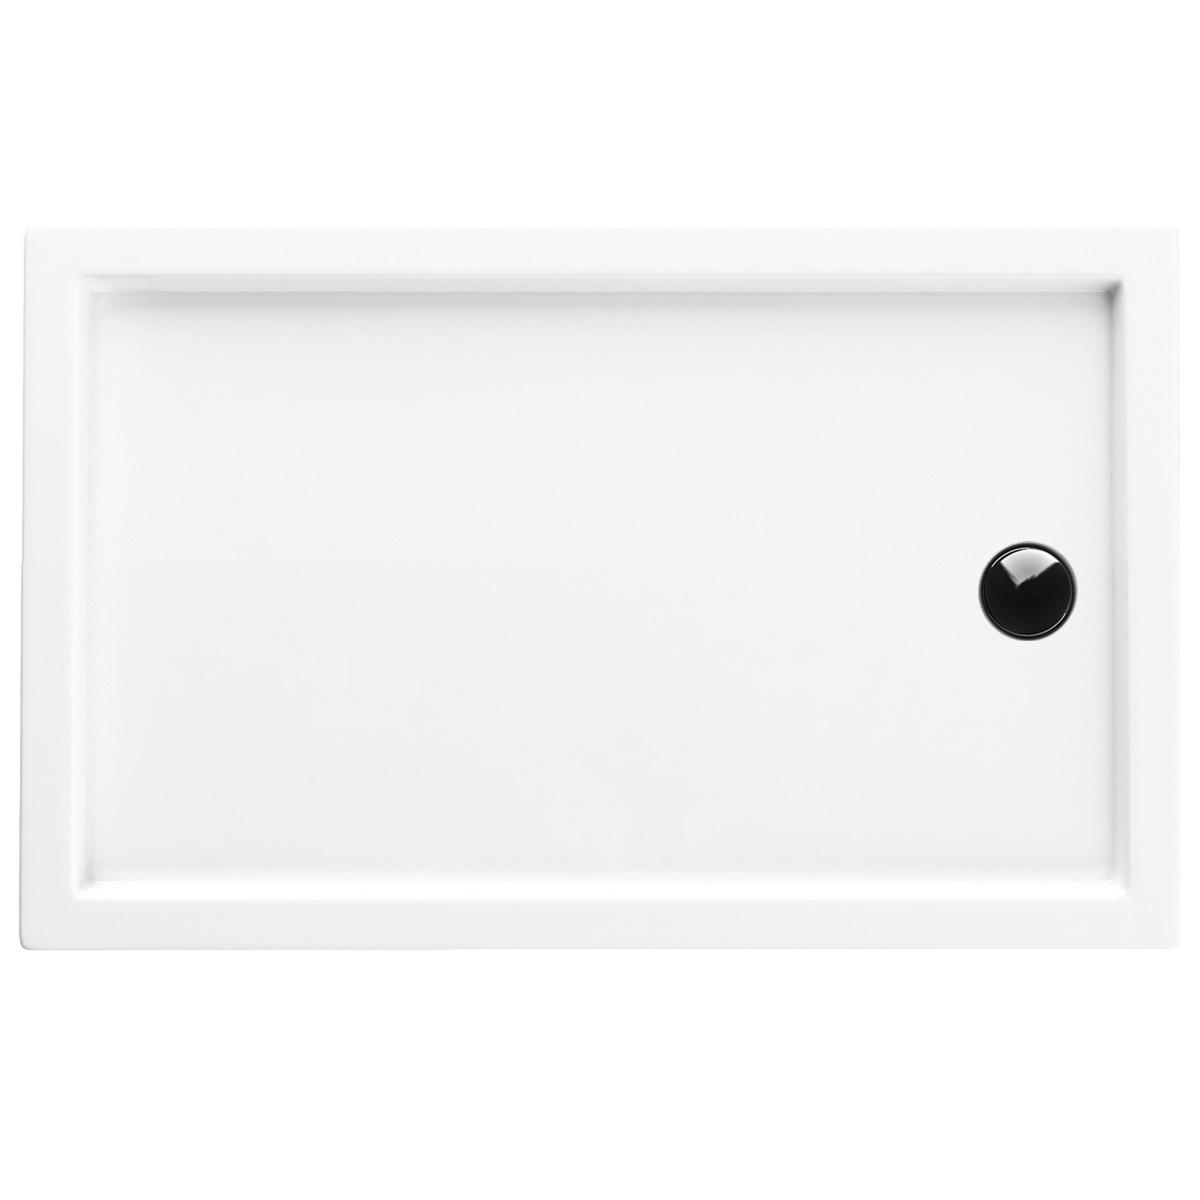 Aquabad® Comfort Villa Flat flache Rechteck Duschtasse 90 x 160 cm